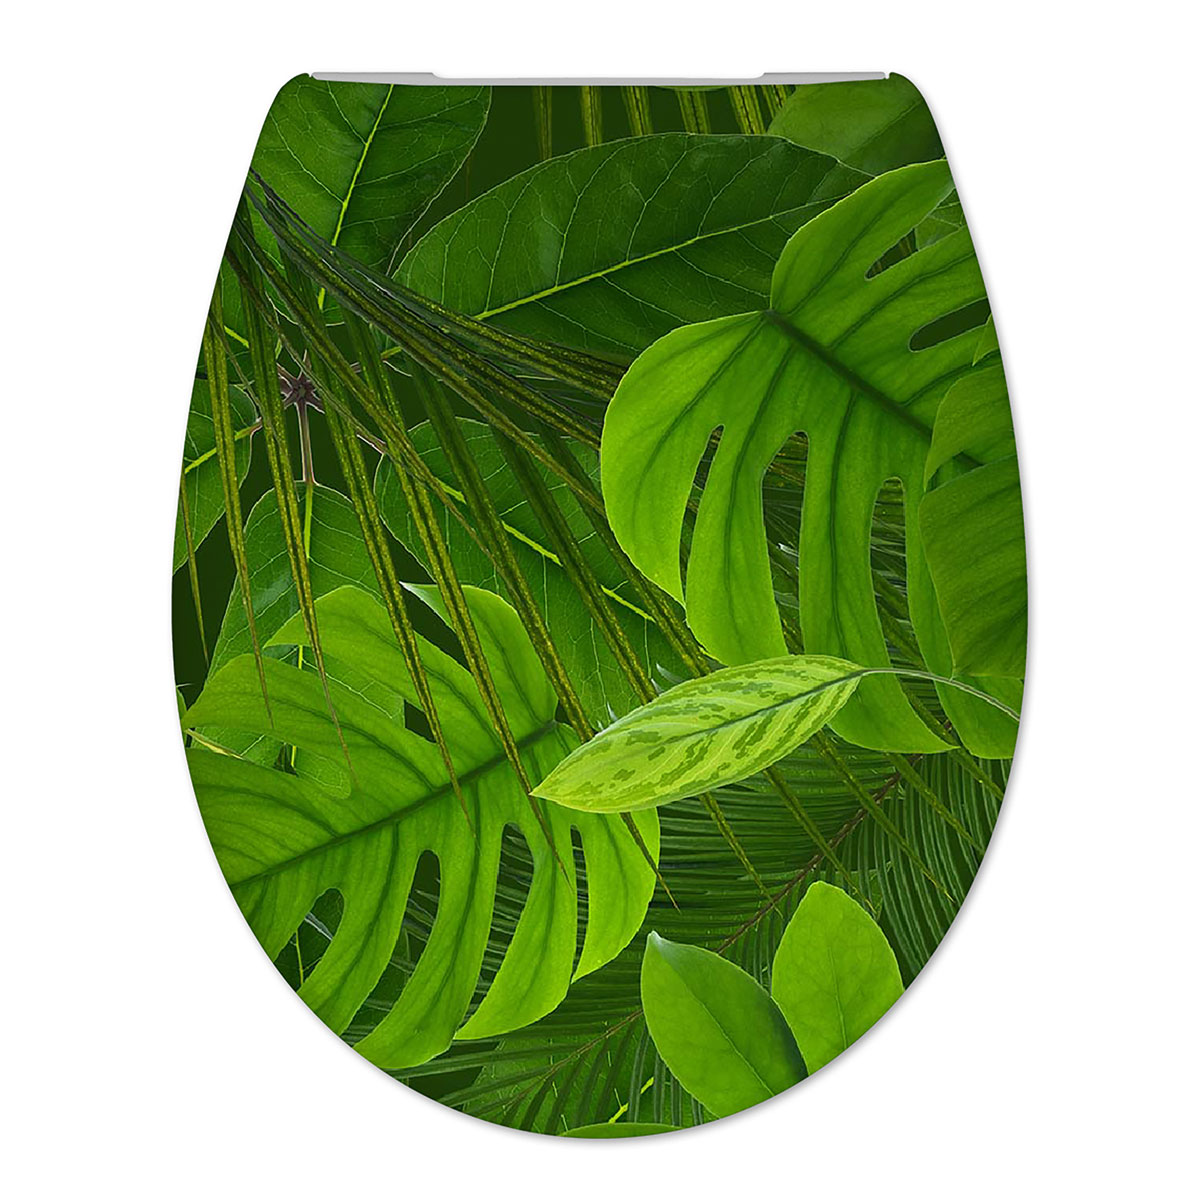 Toiletbril Cedo Jungle Print Duroplast Softclose en Quickrelease Toiletzitting